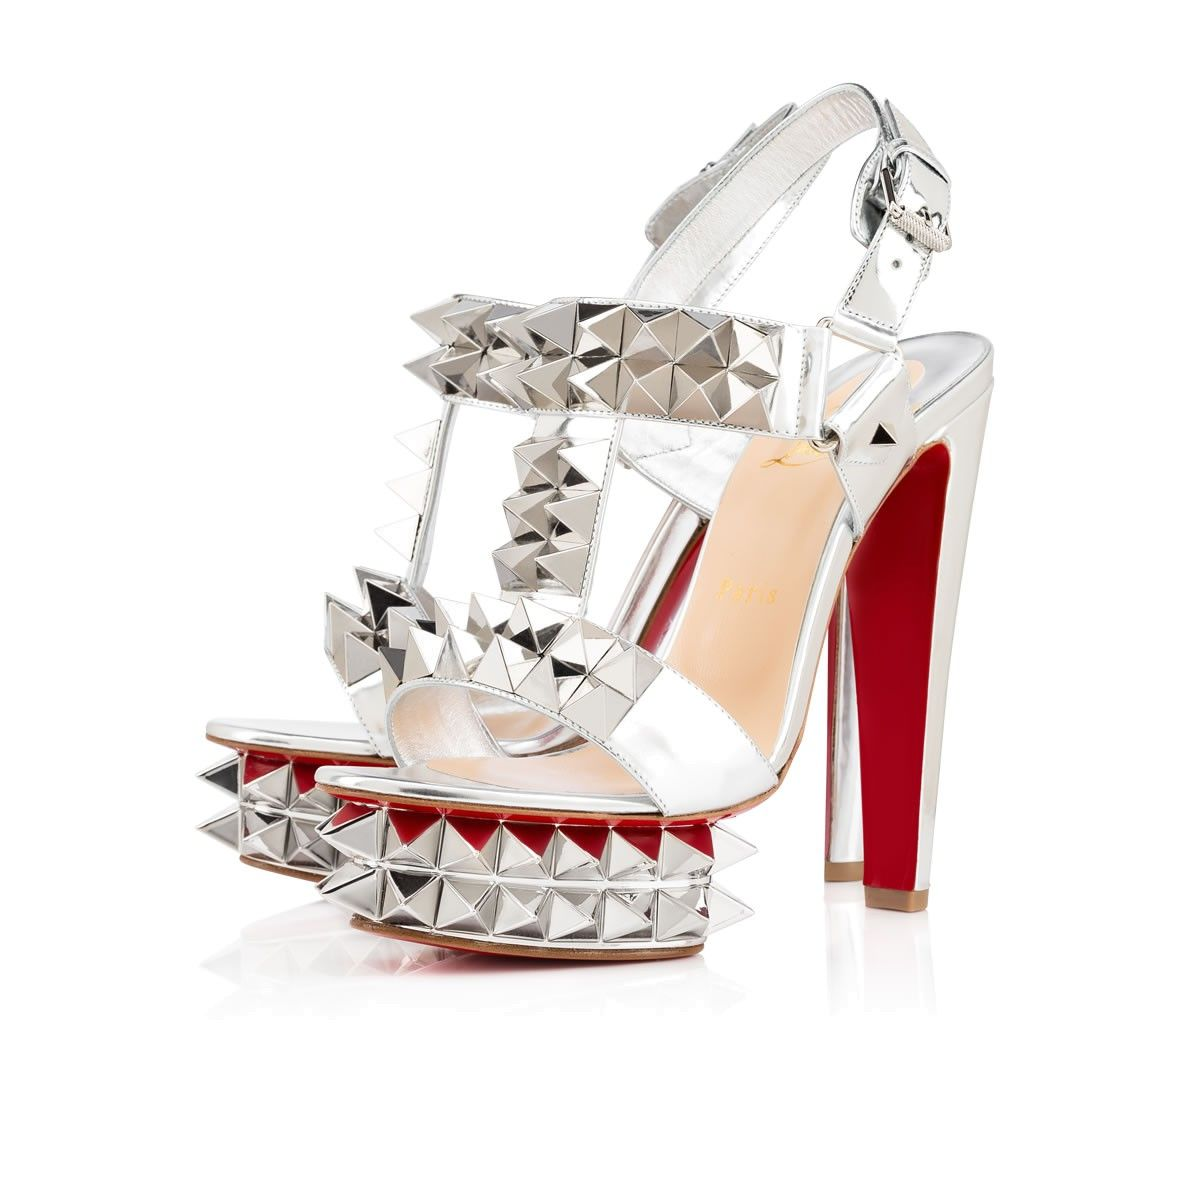 150 Shoes Christian Leather Louboutin Women Cybersandale Silver nP0kw8O